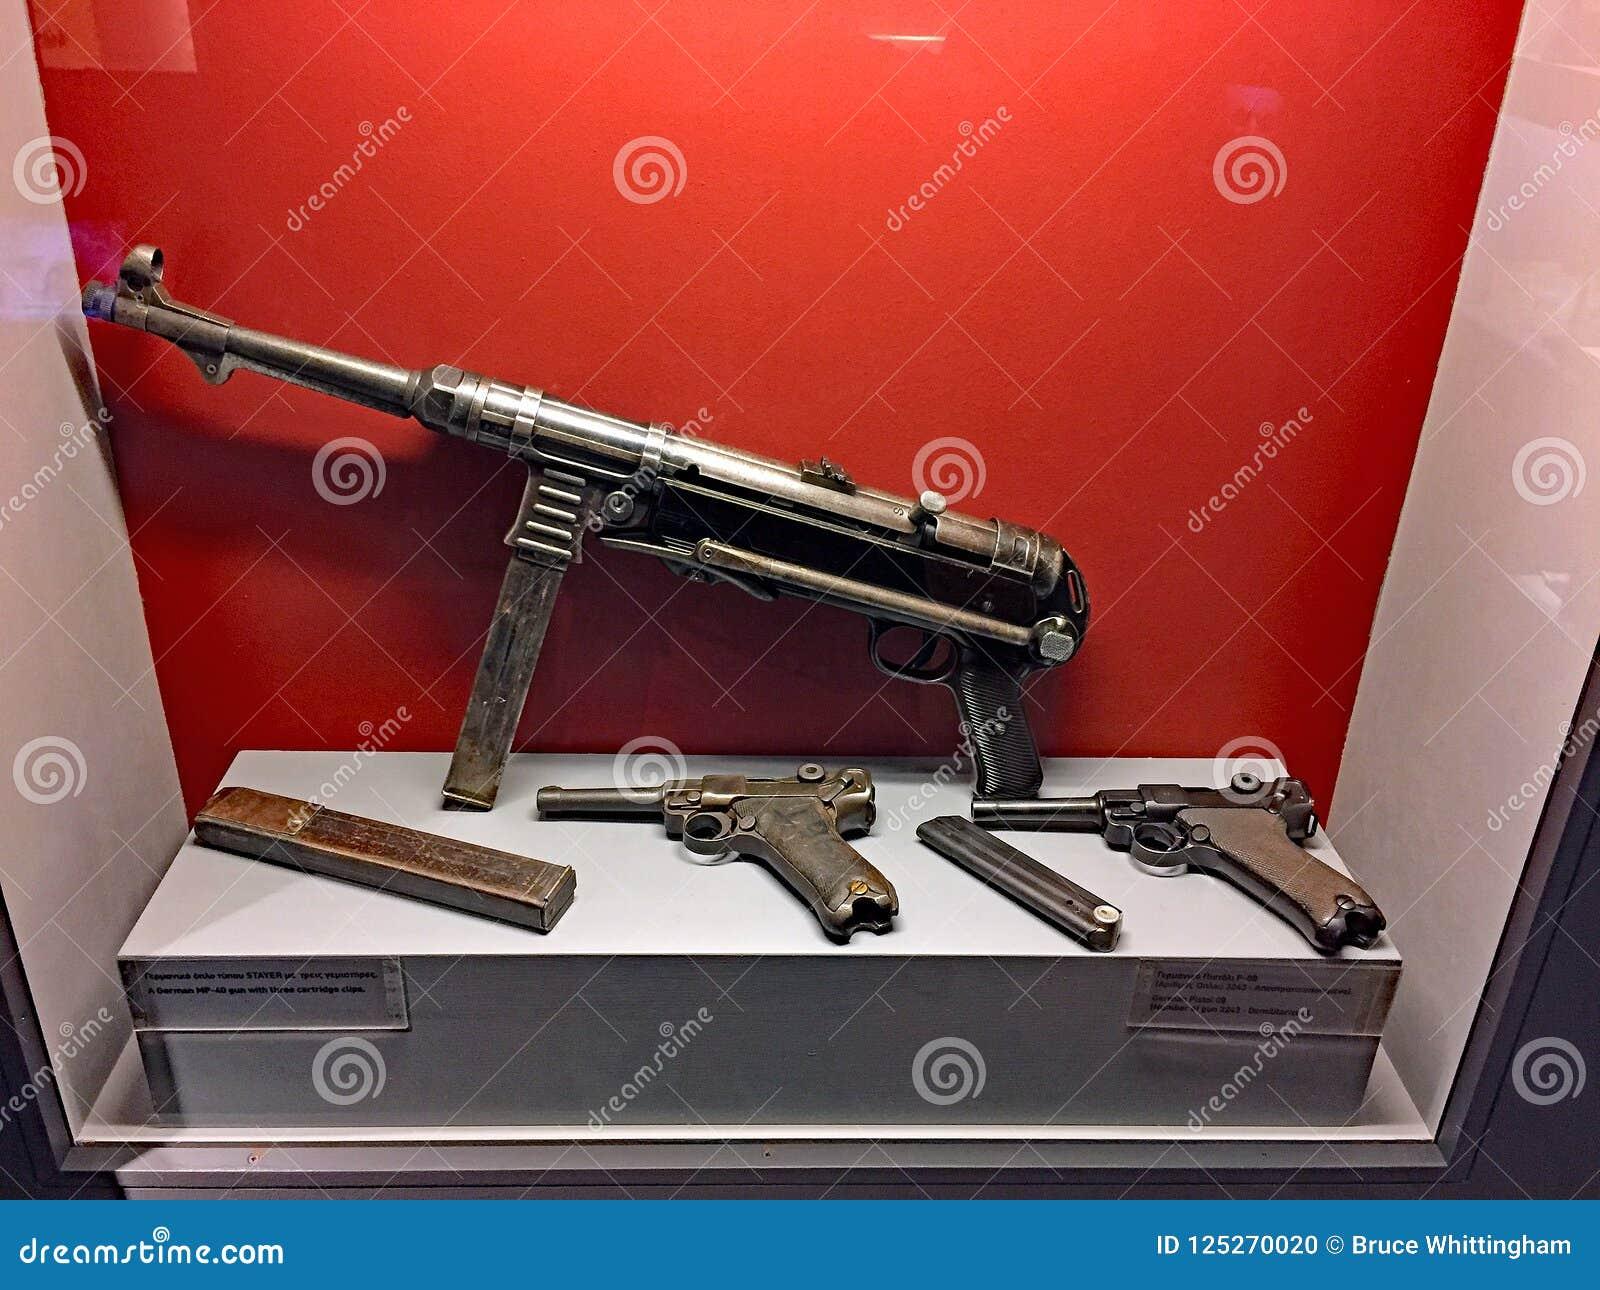 German WW2 Weapons, Museum Of The Kalavryta Holocaust, Peloponnese